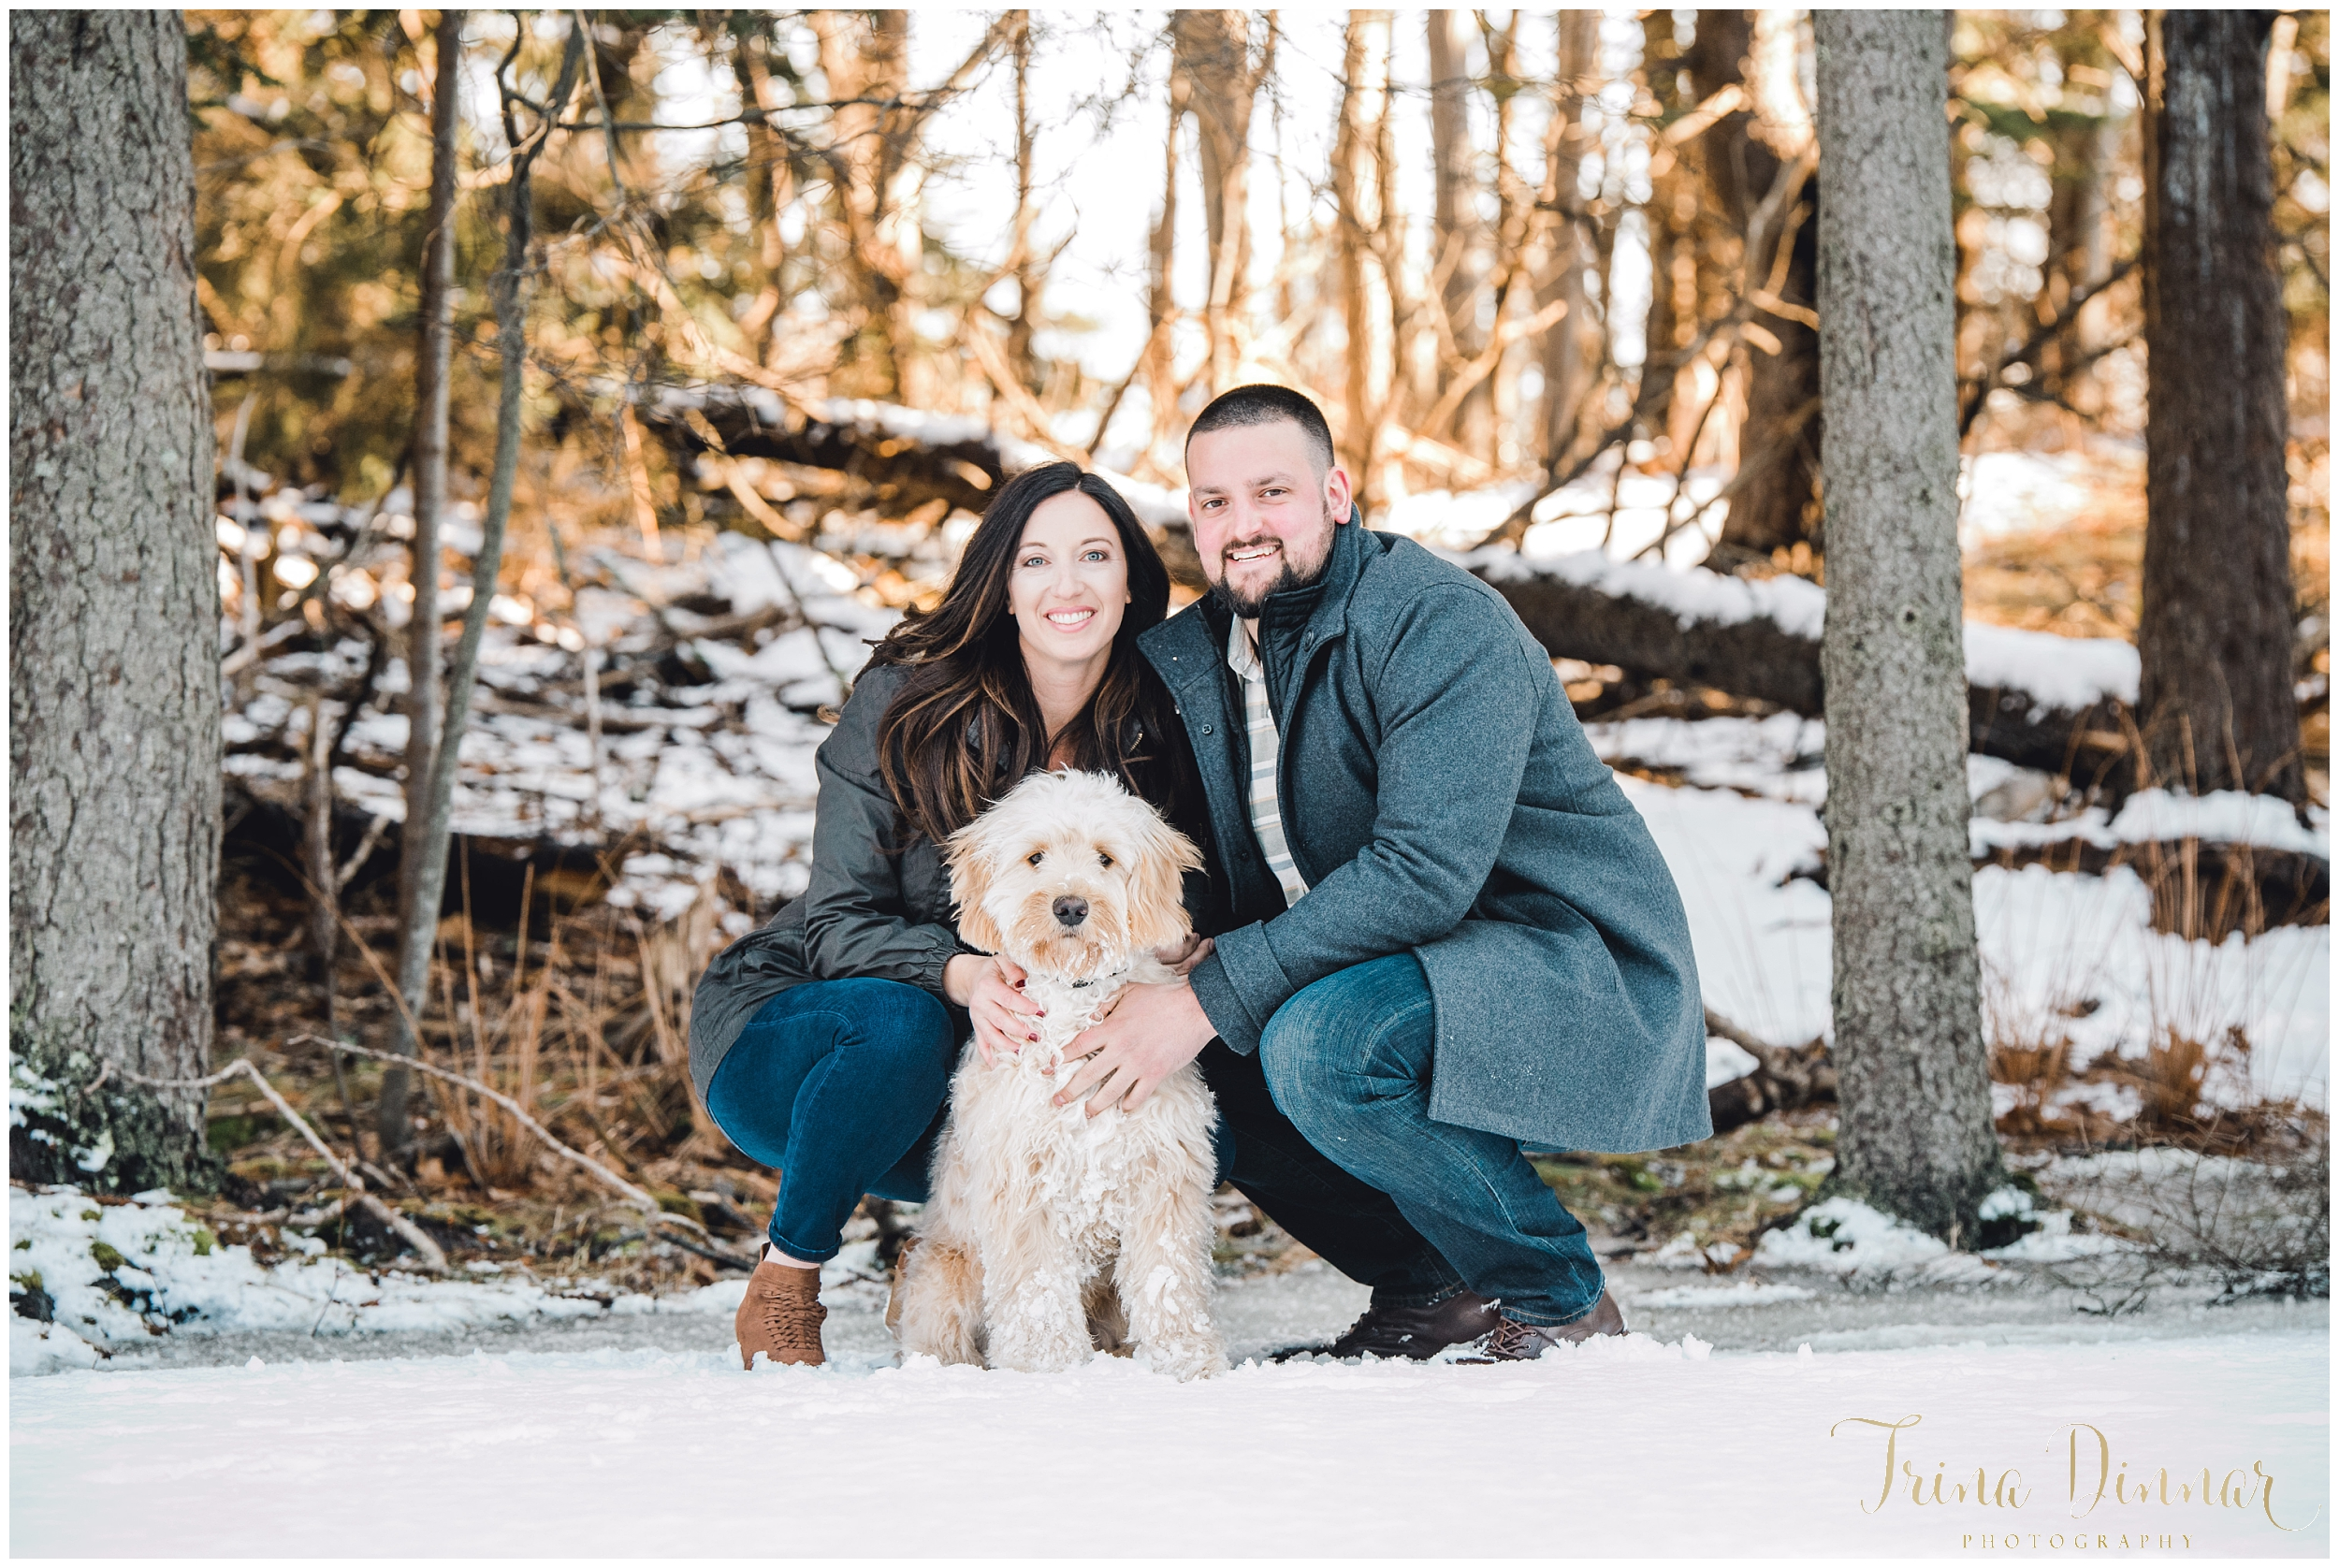 Maine Portrait Photographer captures couple with their dog.